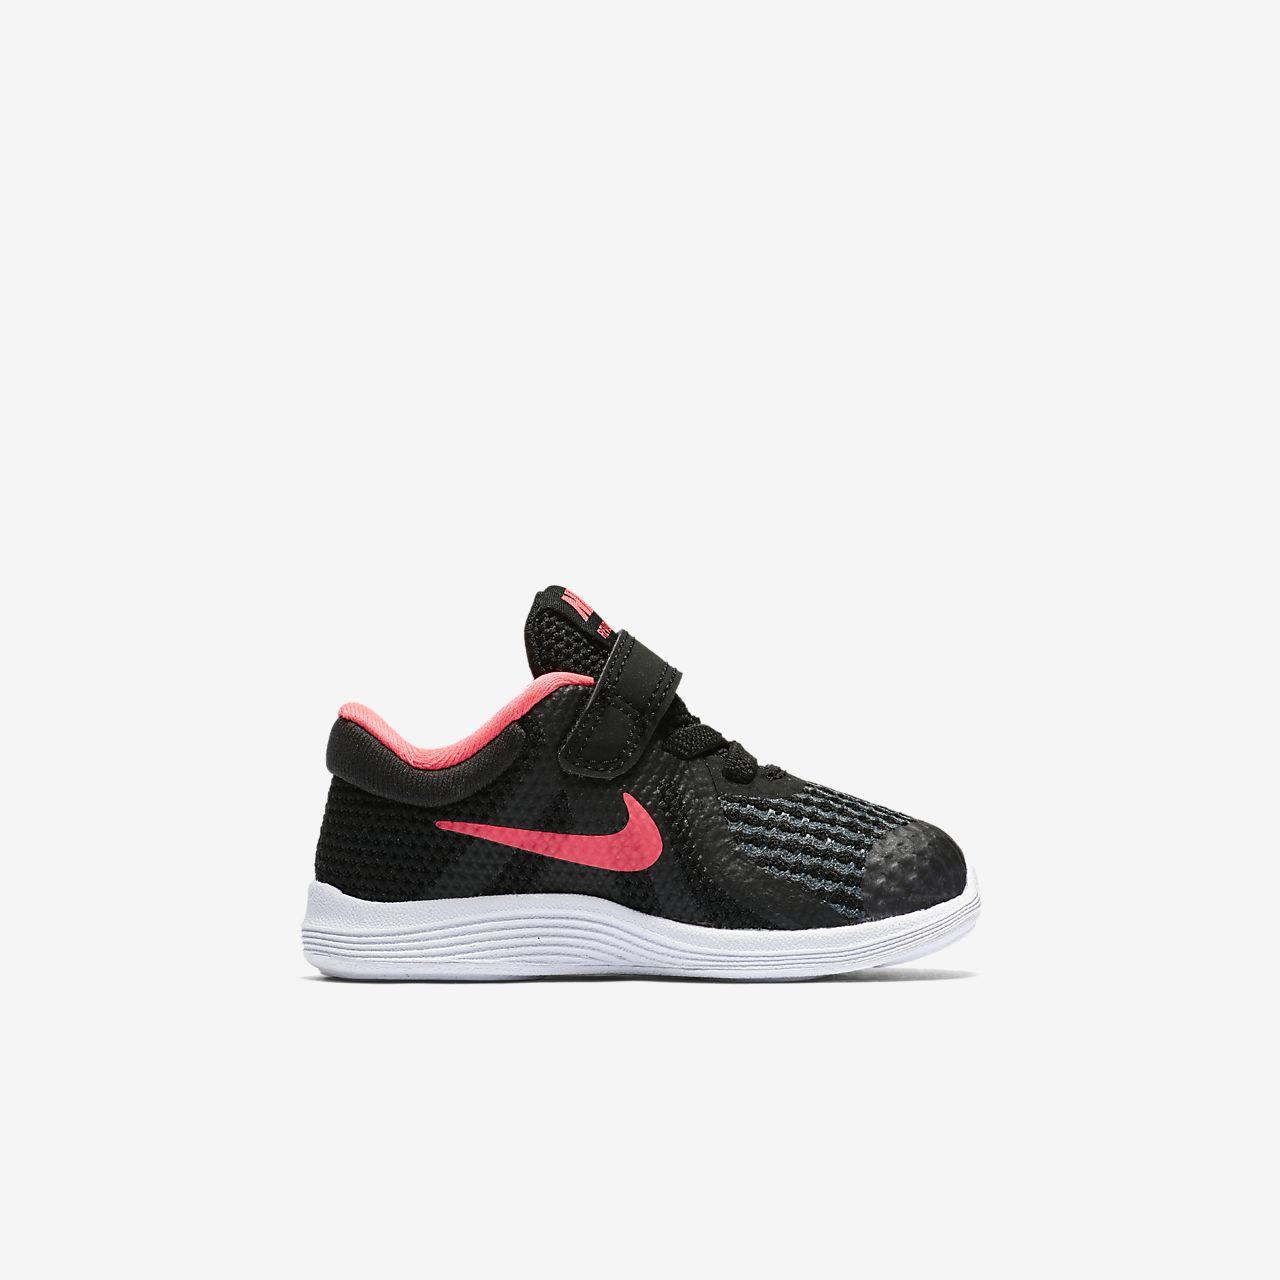 Nike Revolution Zapatillas Bebé E 4 Infantil f6yIgvmYb7